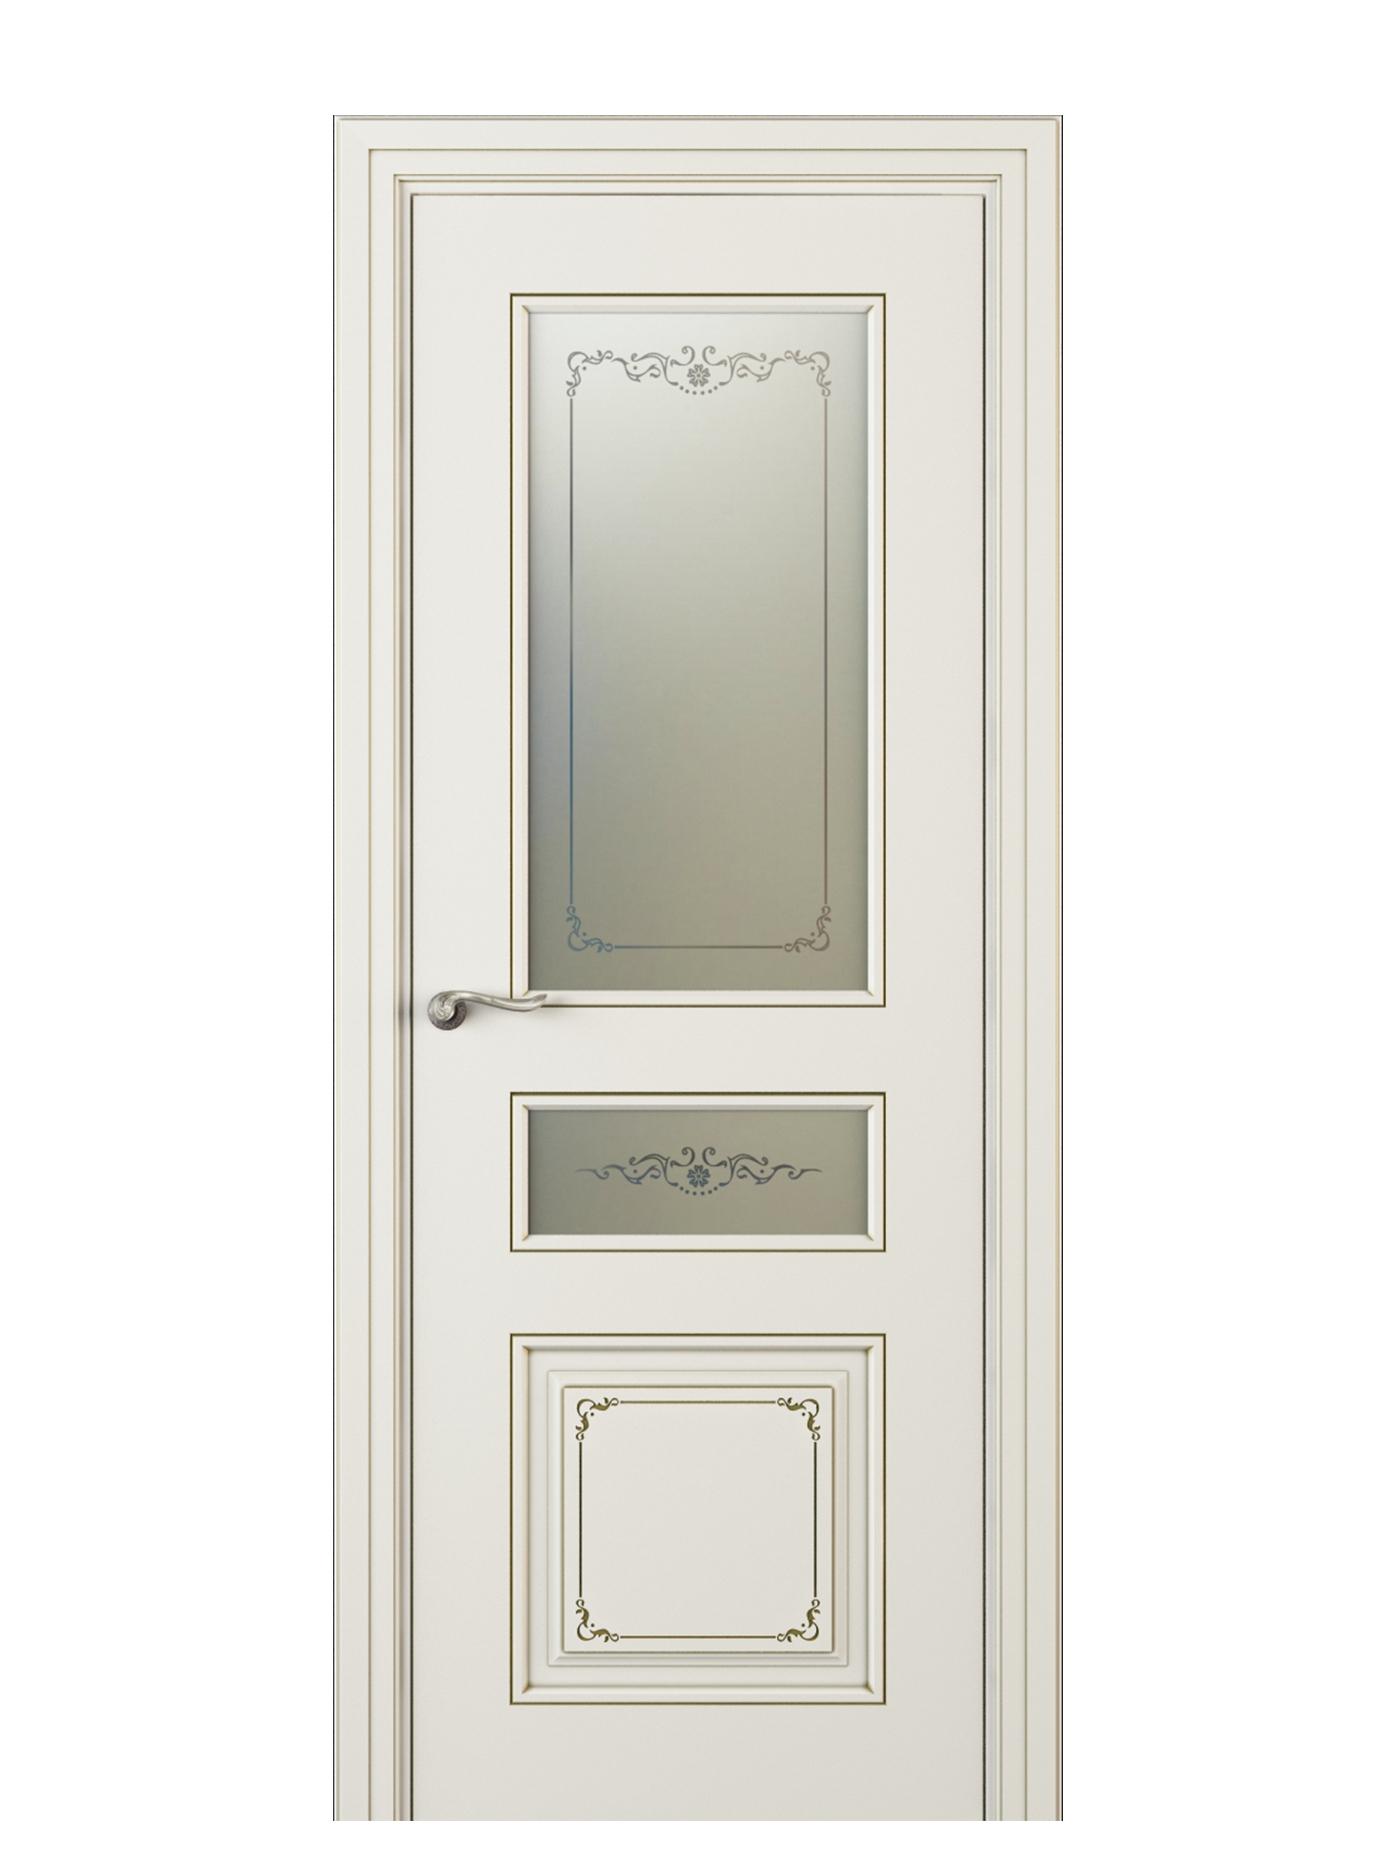 Image Fabrizia Vetro Duo Interior Door Italian Enamel 9010 0